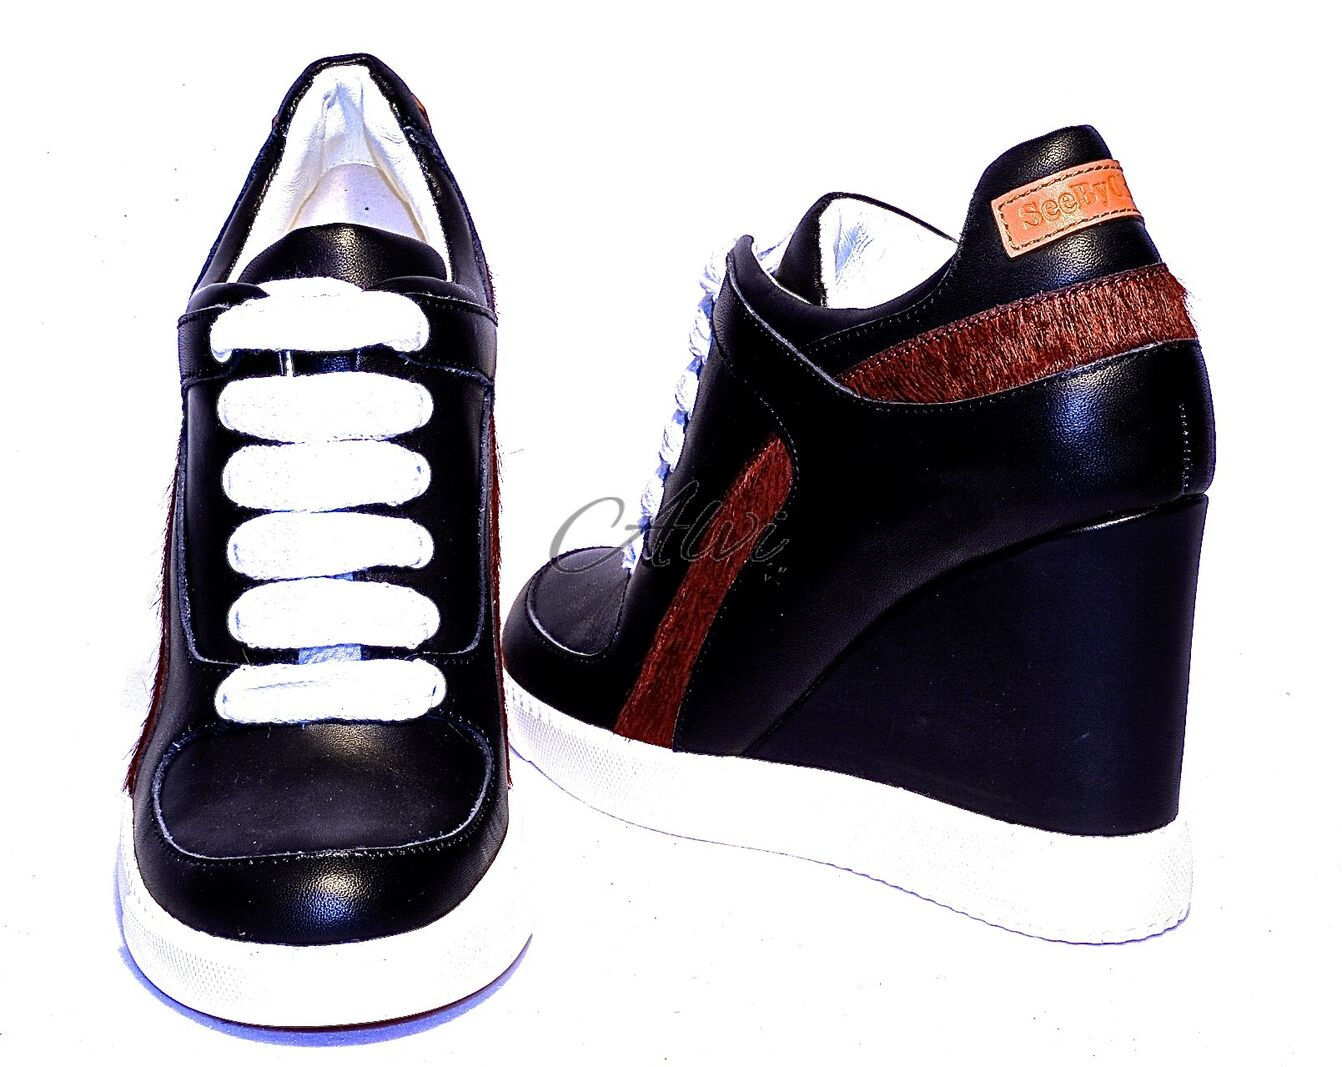 Zeppa See Alta Sneakers By Con Chloé LzMqSUpVG